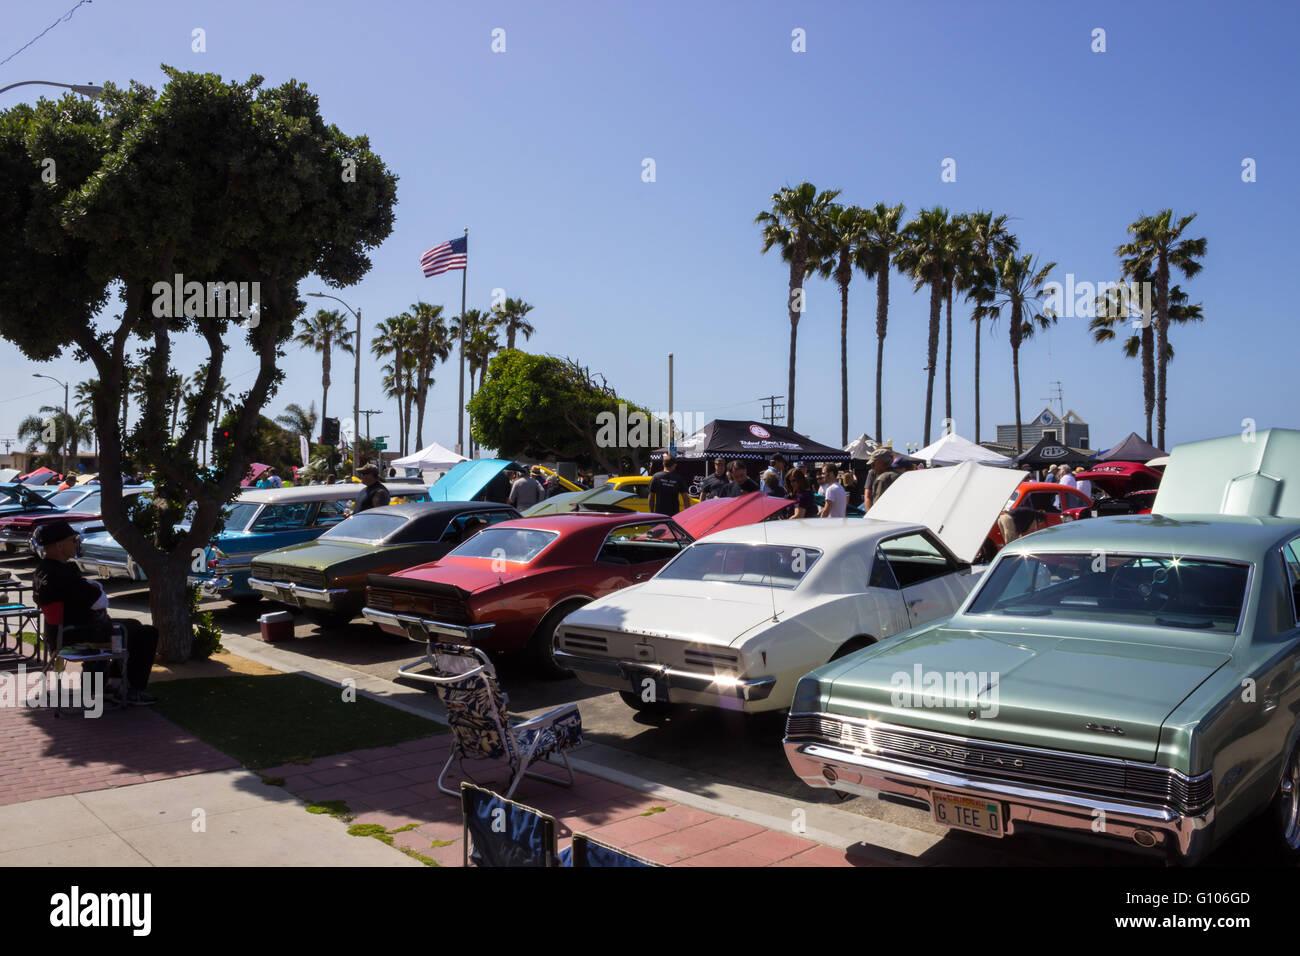 Seal Beach Orange County California Stock Photos Seal Beach Orange - Seal beach car show